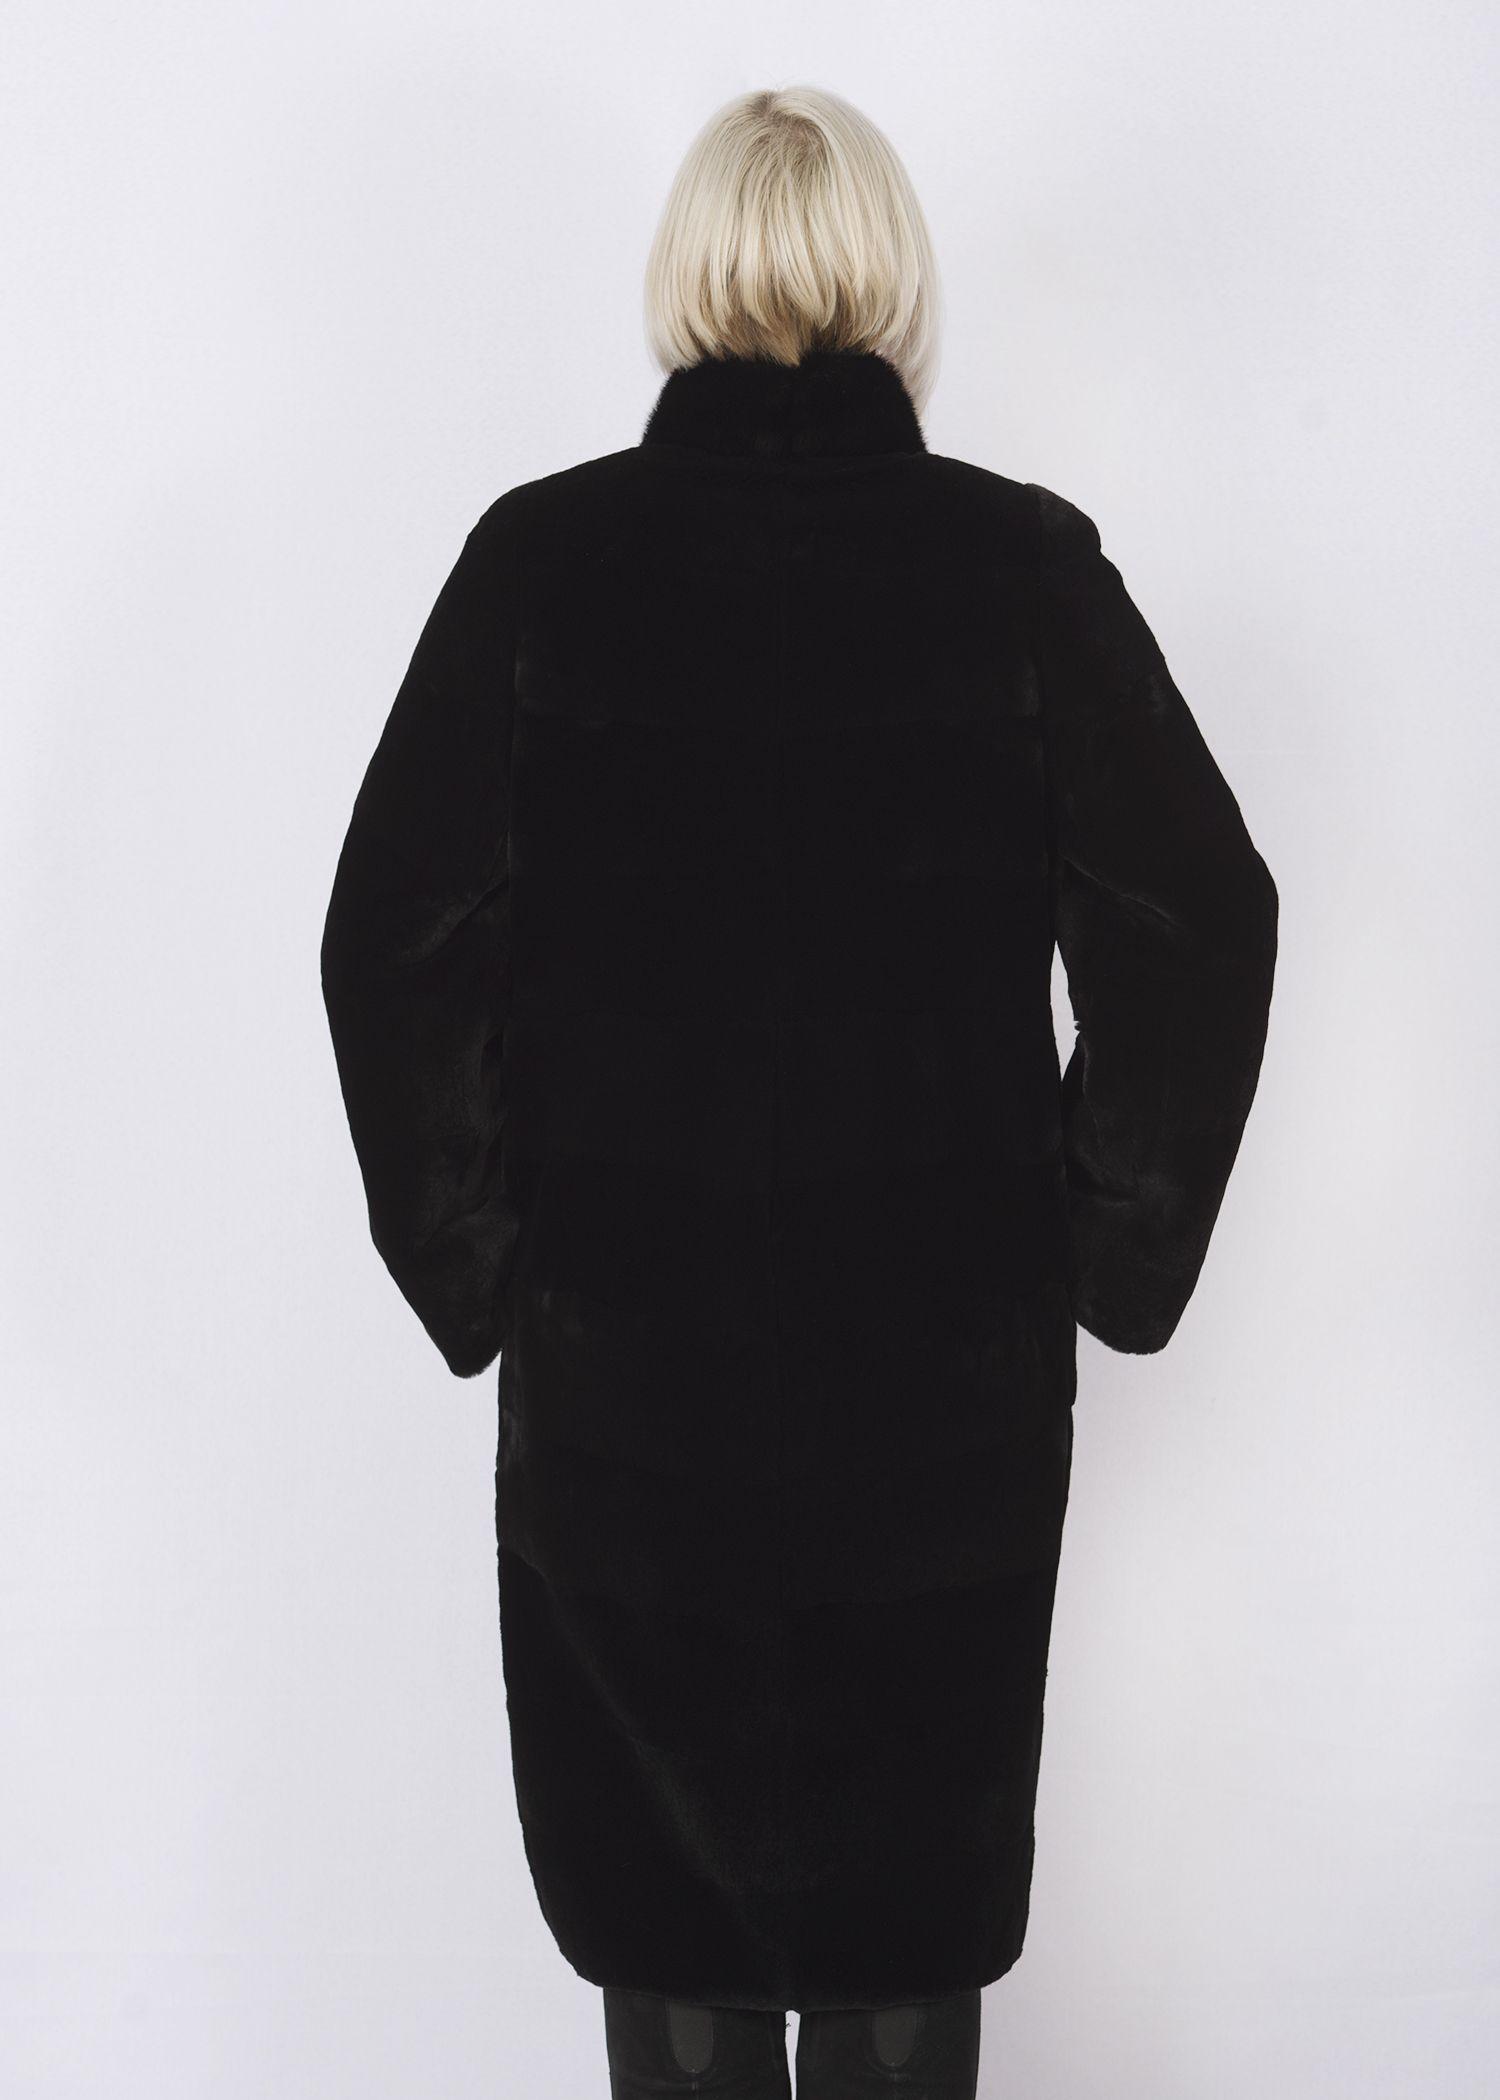 Шуба женская из бобрика(rex) WT190-14 фото №1